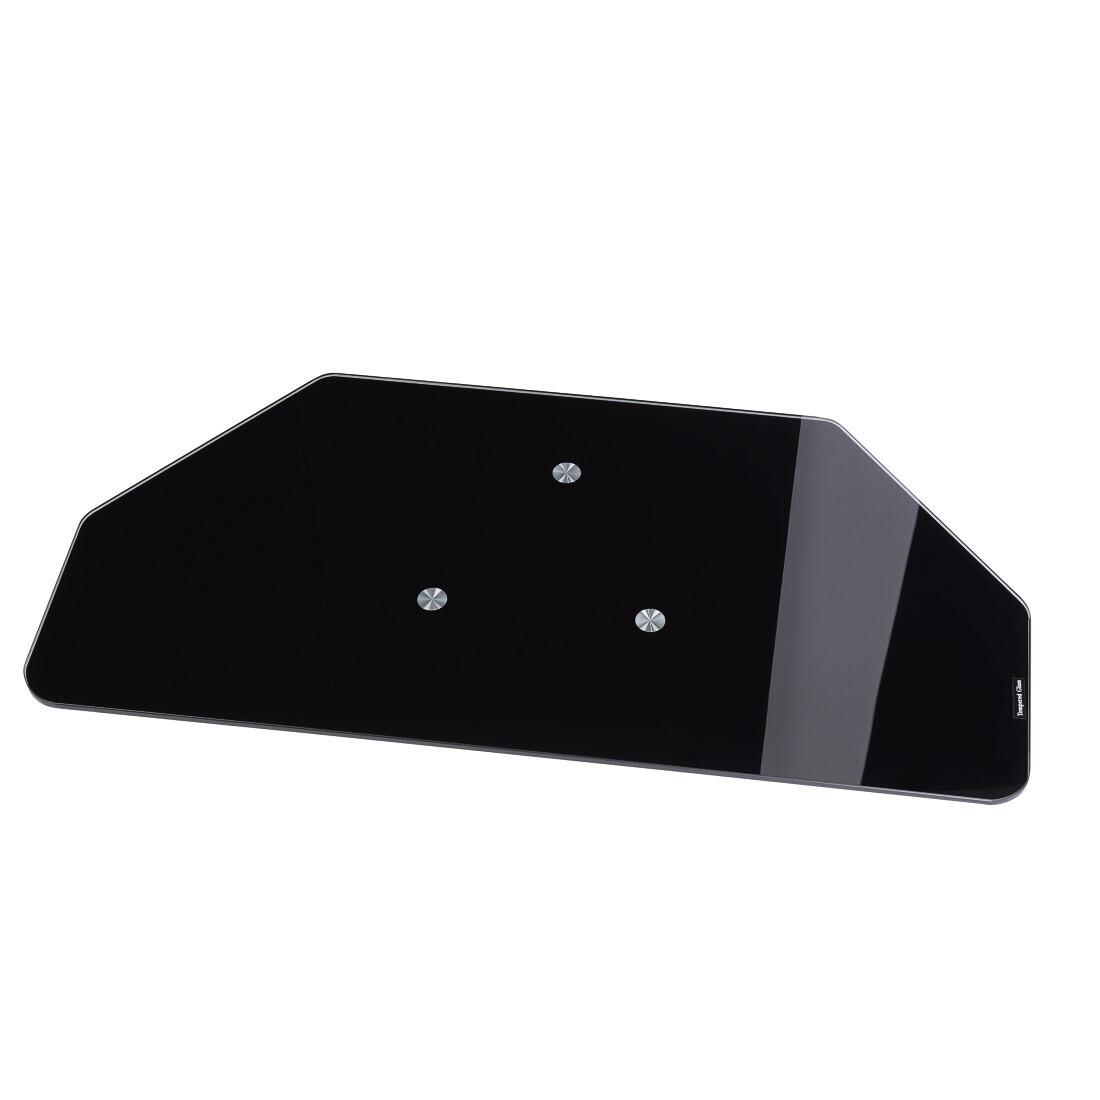 Hama LCD-/Plasma-TV-draaiplateau, Glas, zwart